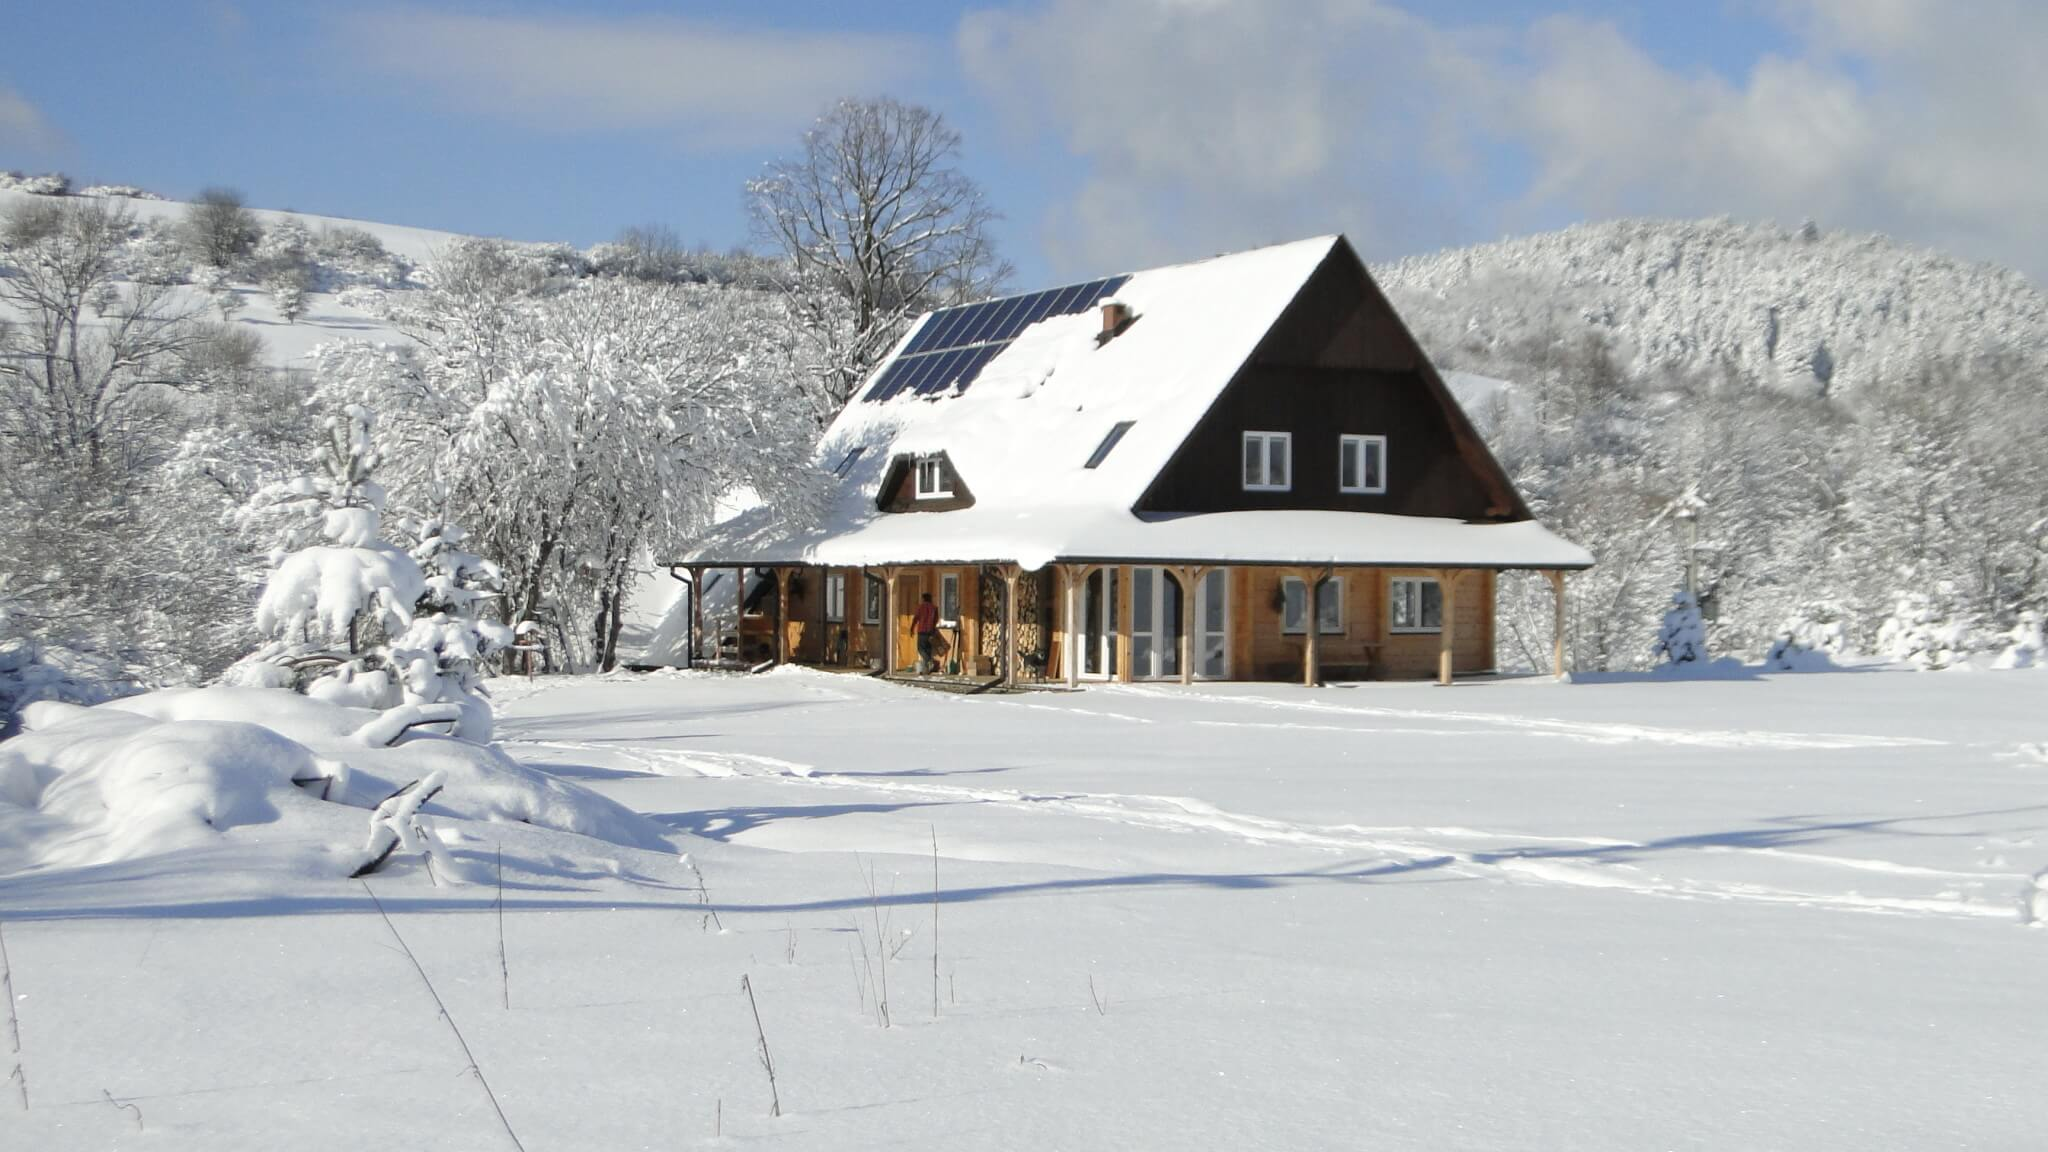 Lutowa zima - śnieżna i mroźna 8